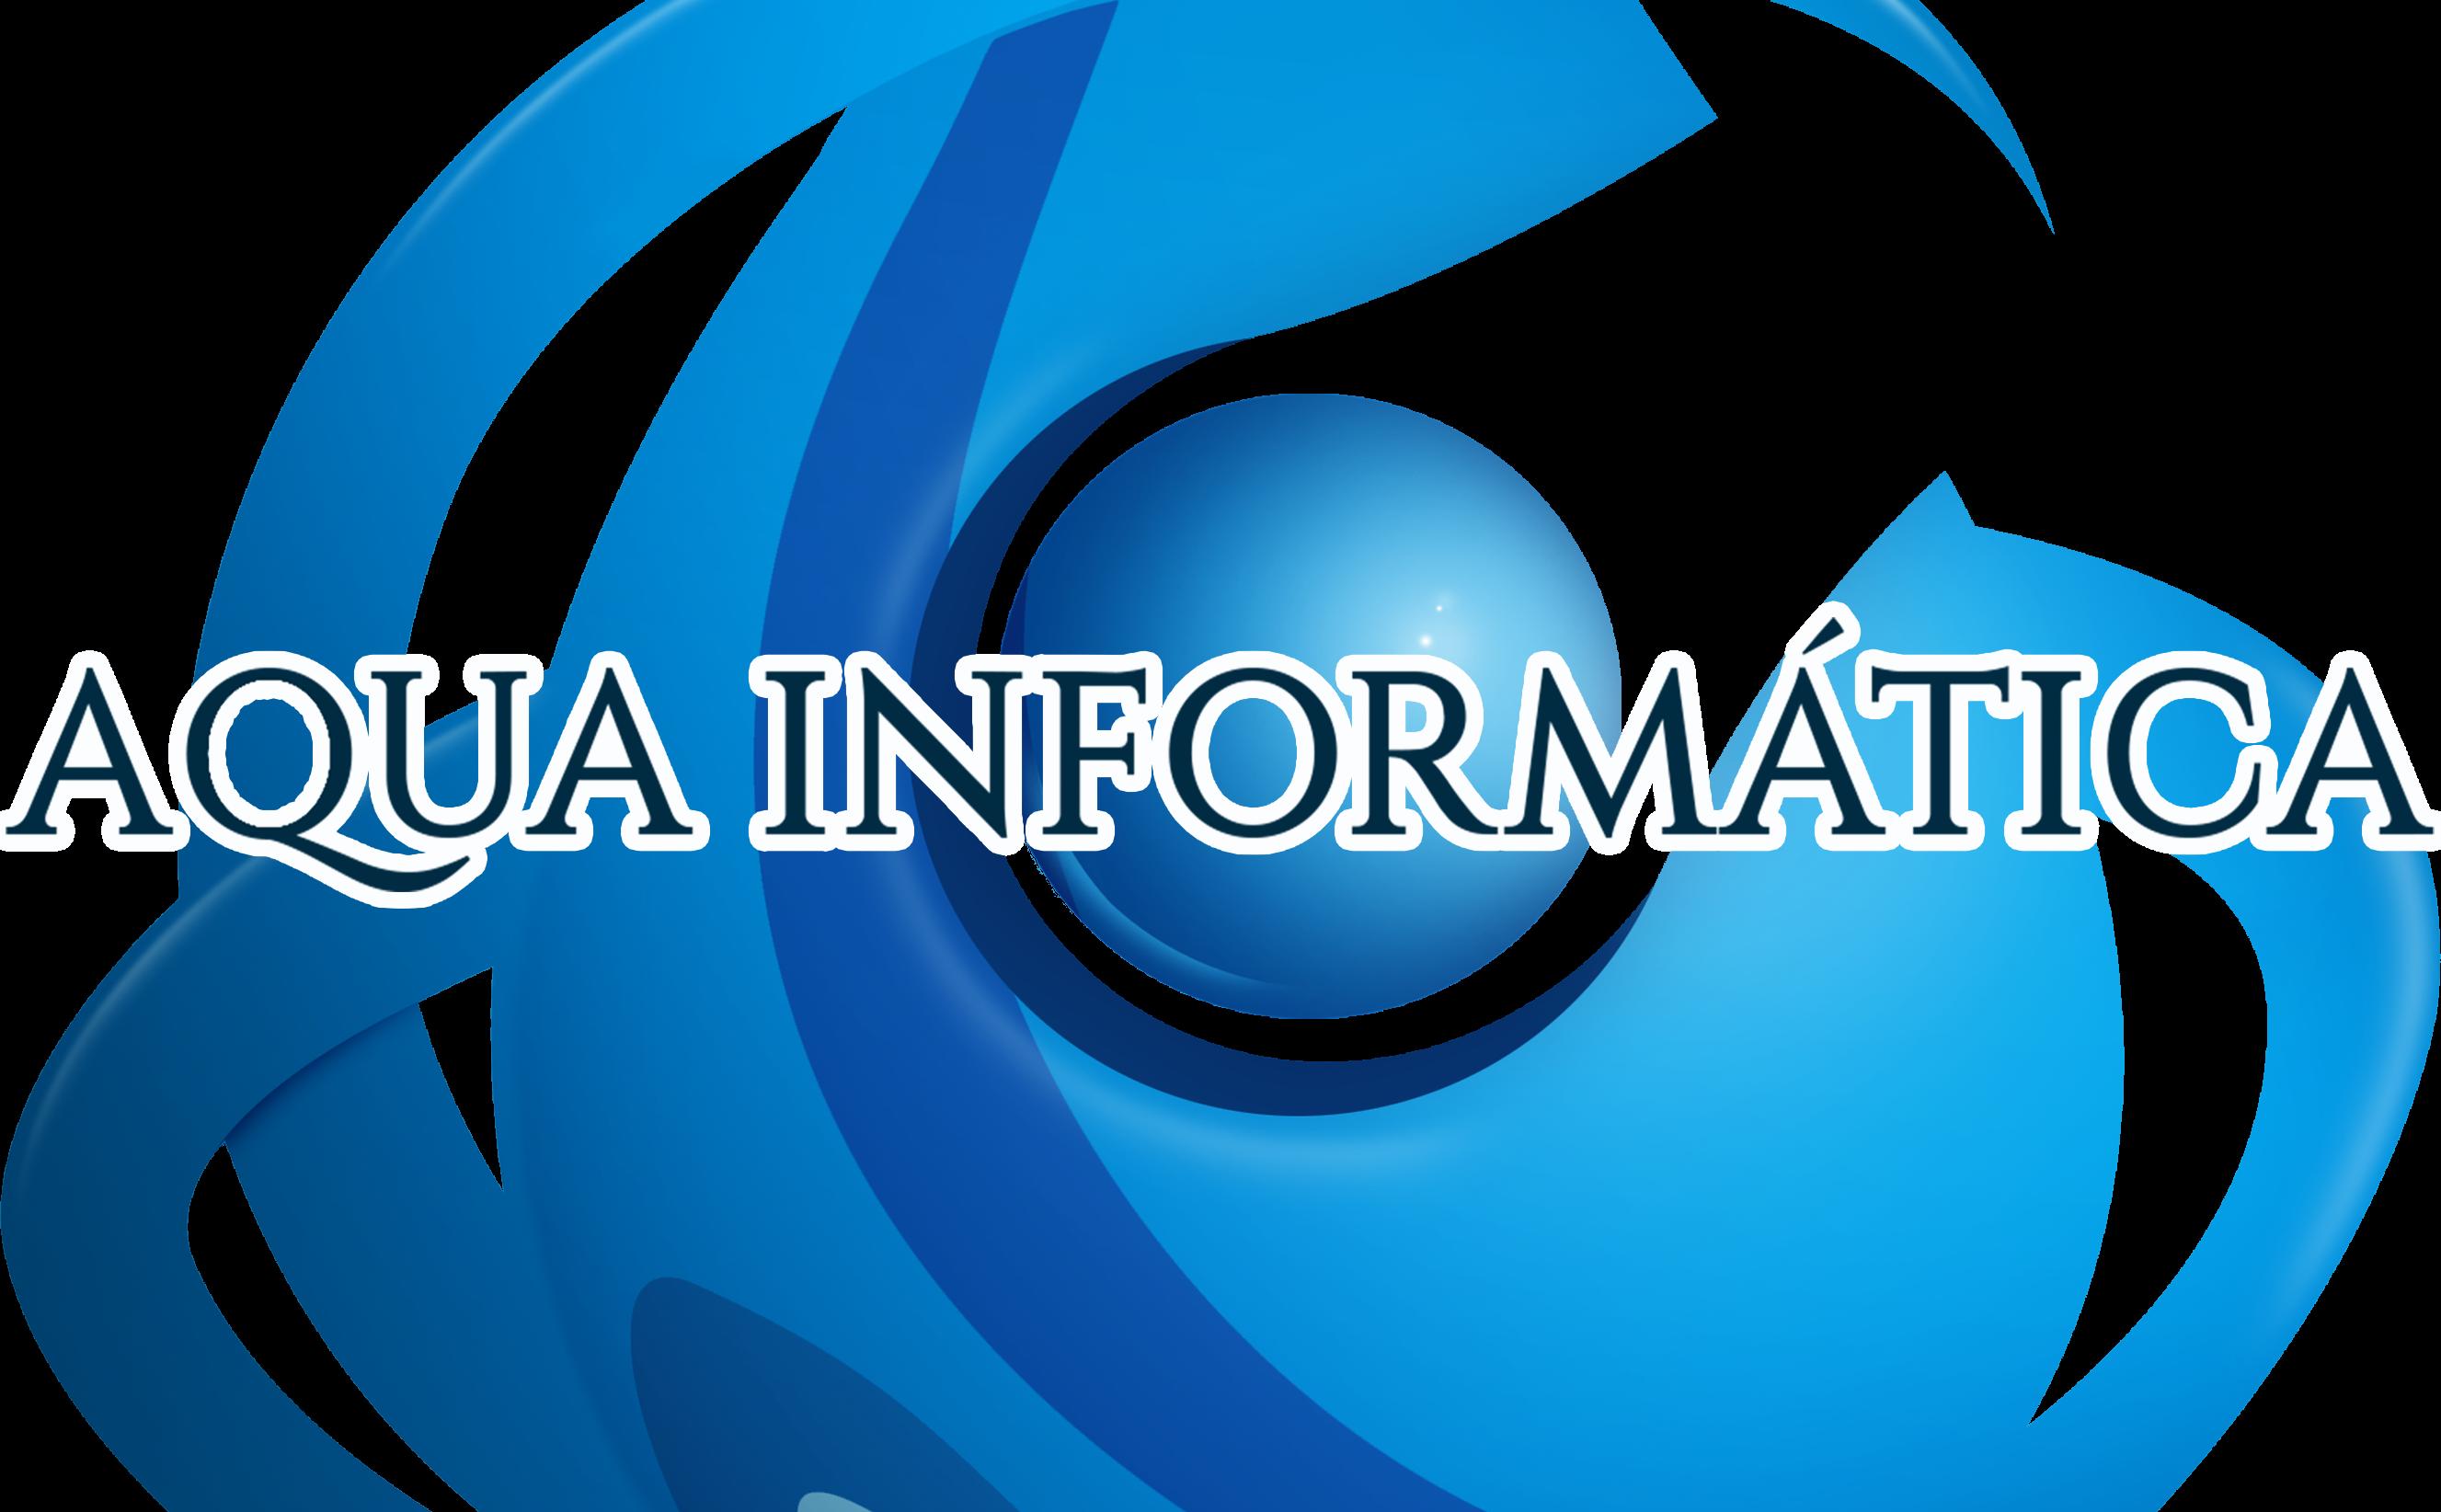 Aqua Informática